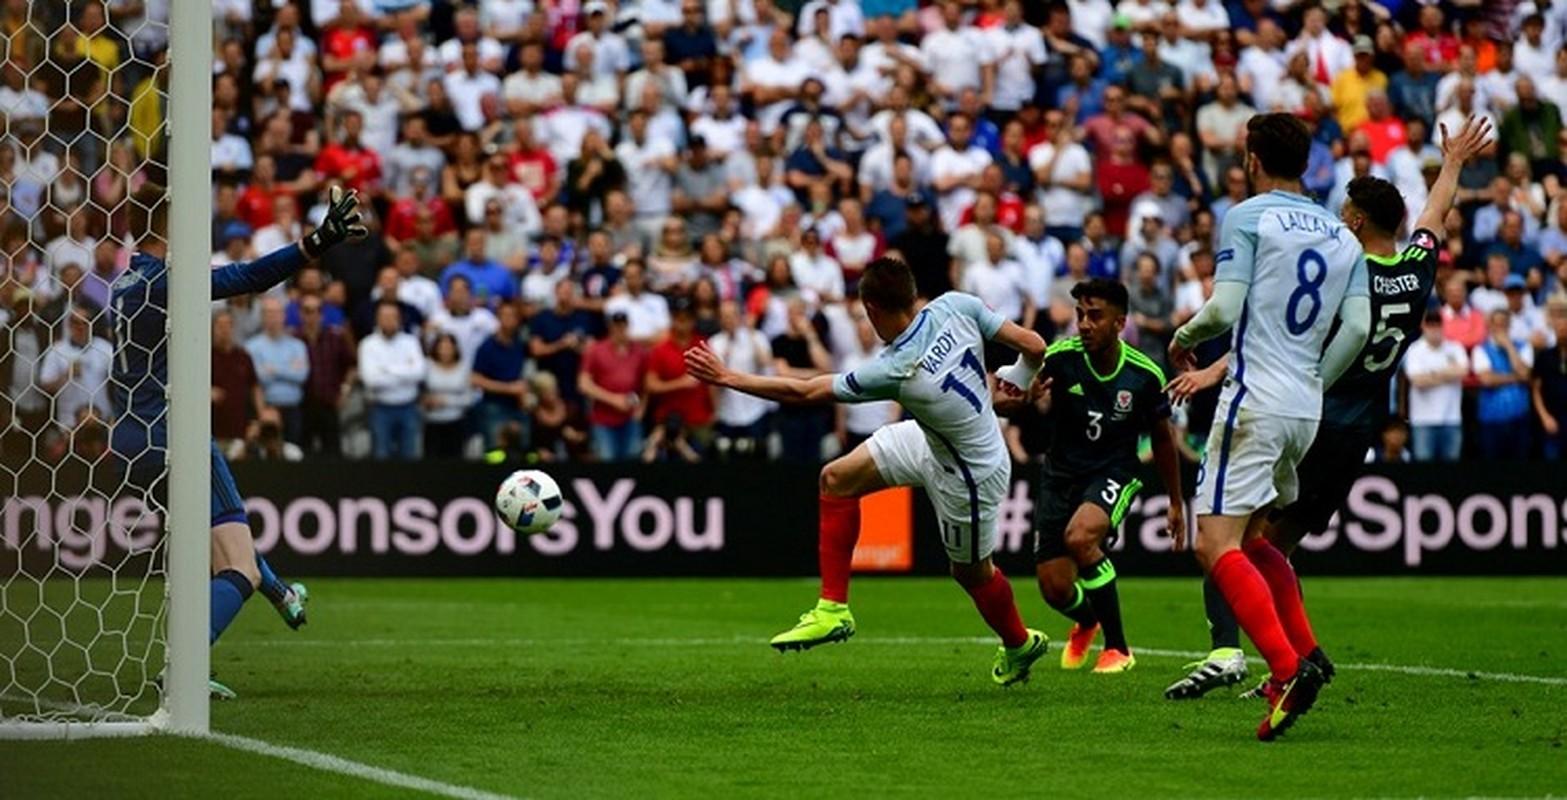 Anh Euro 2016 Anh 2-1 xu Wales: Vardy, Sturridge cuu roi Tam Su-Hinh-11